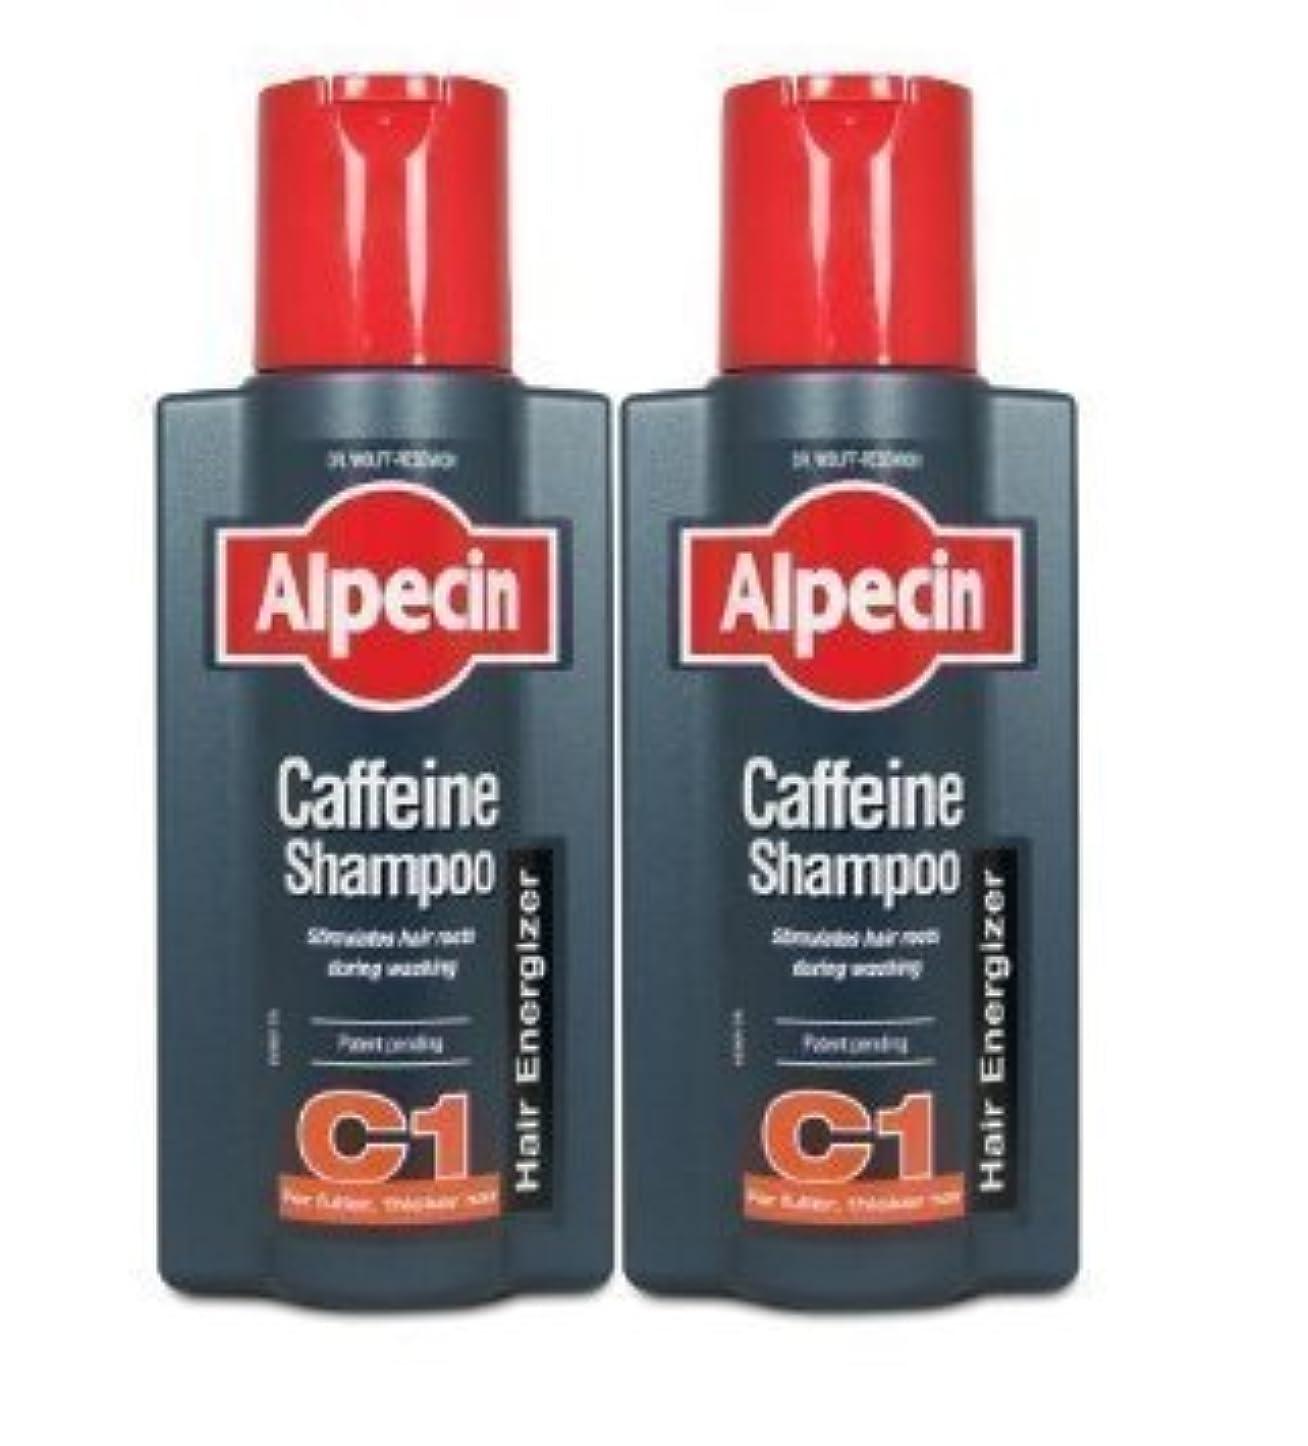 埋め込む無法者織機2 X Alpecin Caffeine Shampoo [並行輸入品]